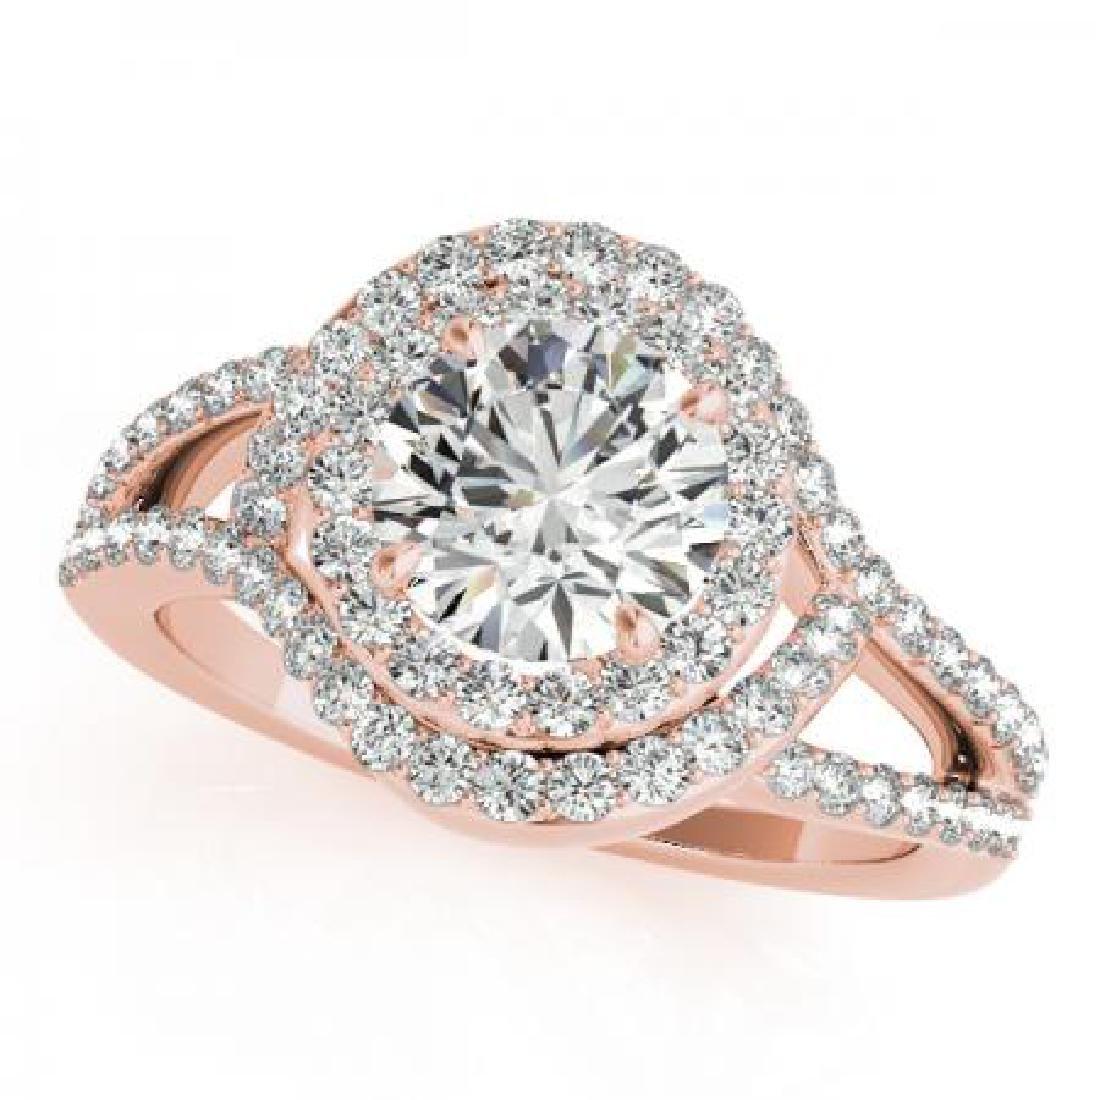 CERTIFIED 14KT ROSE GOLD 1.68 CT G-H/VS-SI1 DIAMOND HAL